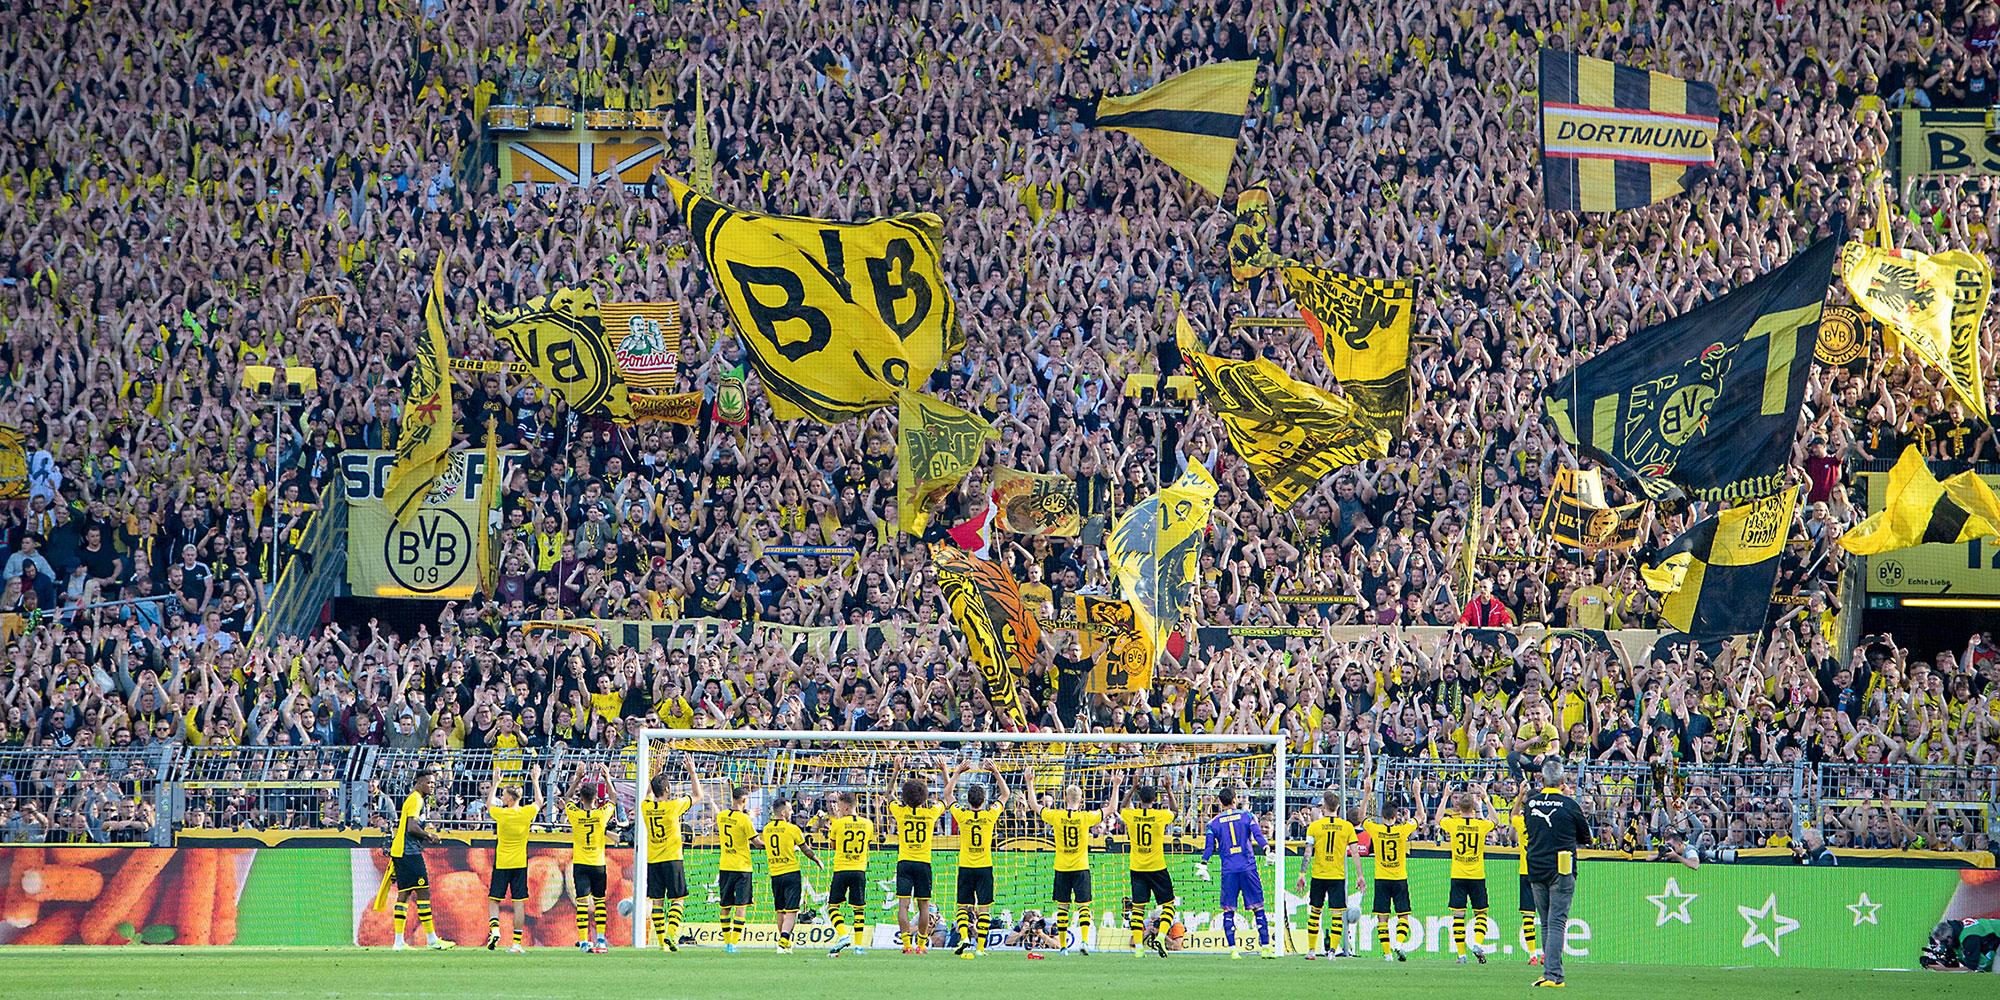 Dortmund, la vraie capitale du football allemand